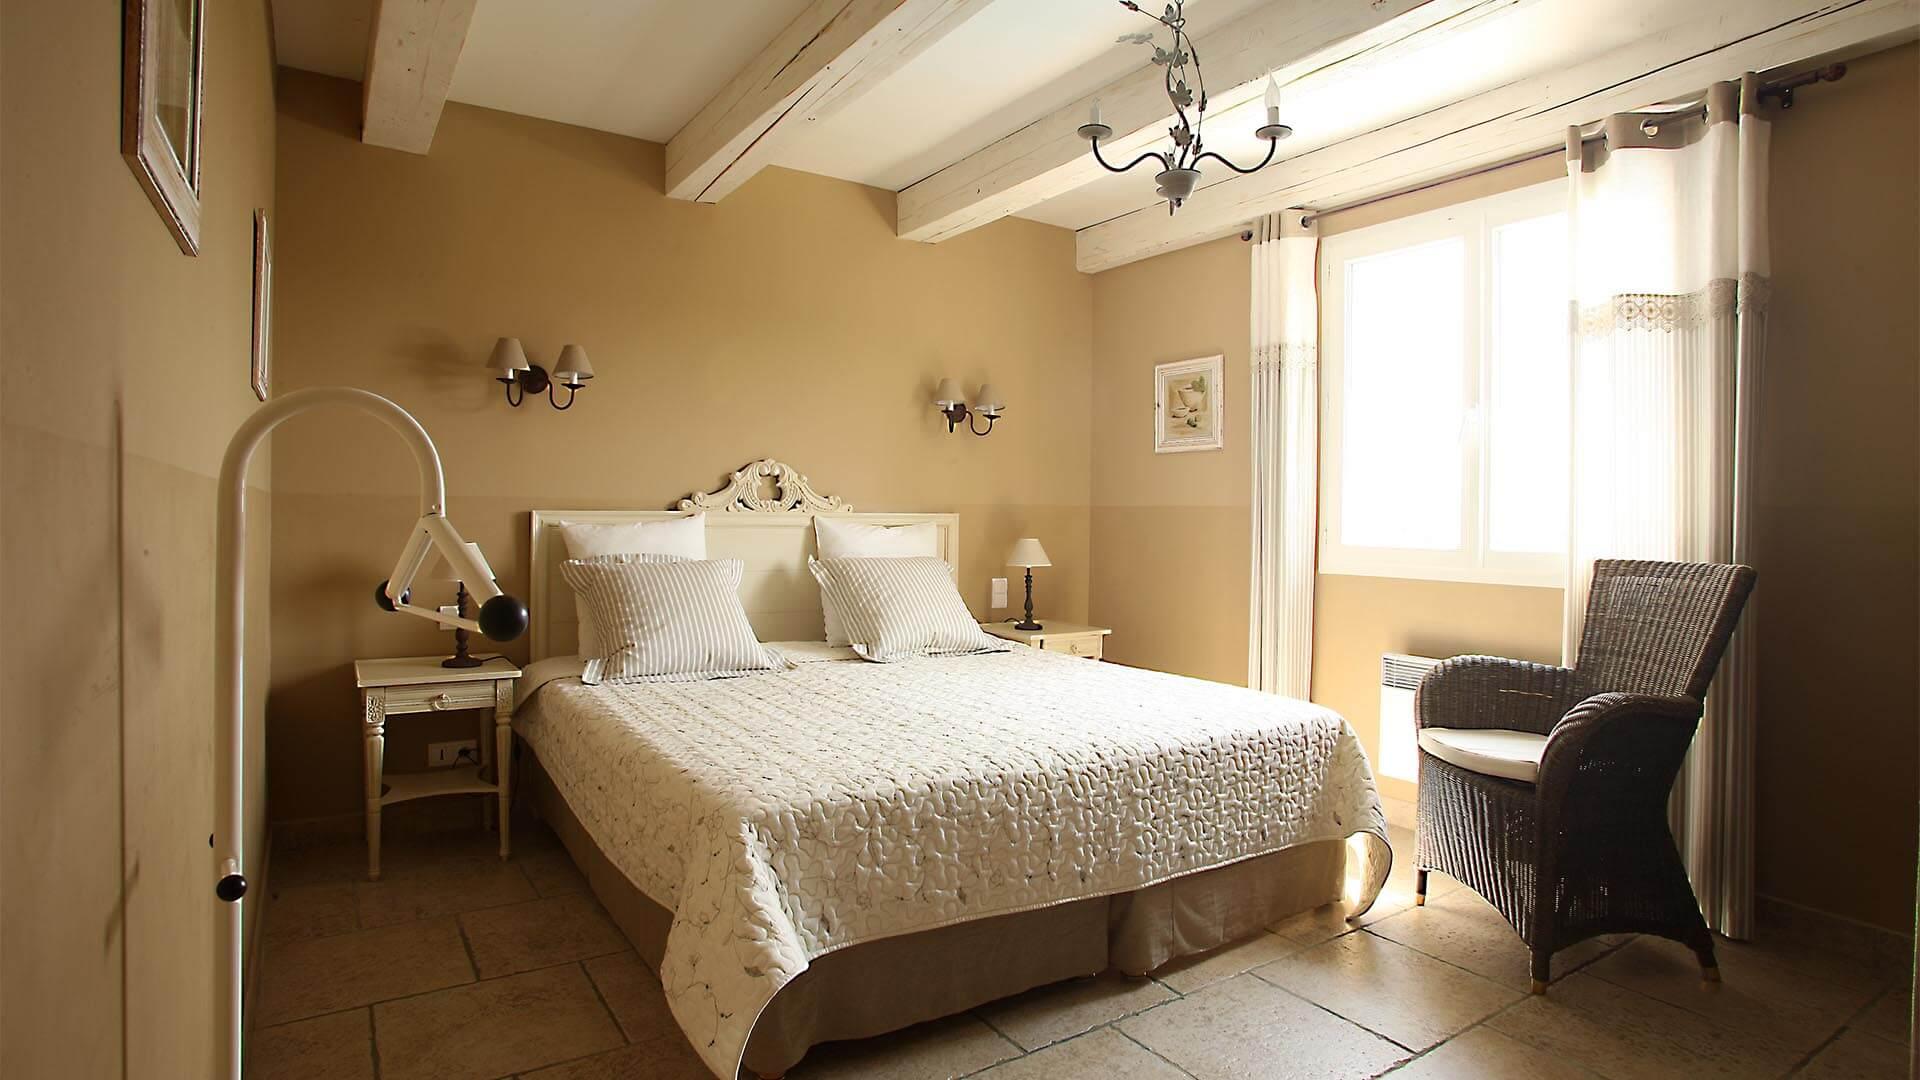 Location villa de vacances Luberon | Villa les oliviers | Chambre double